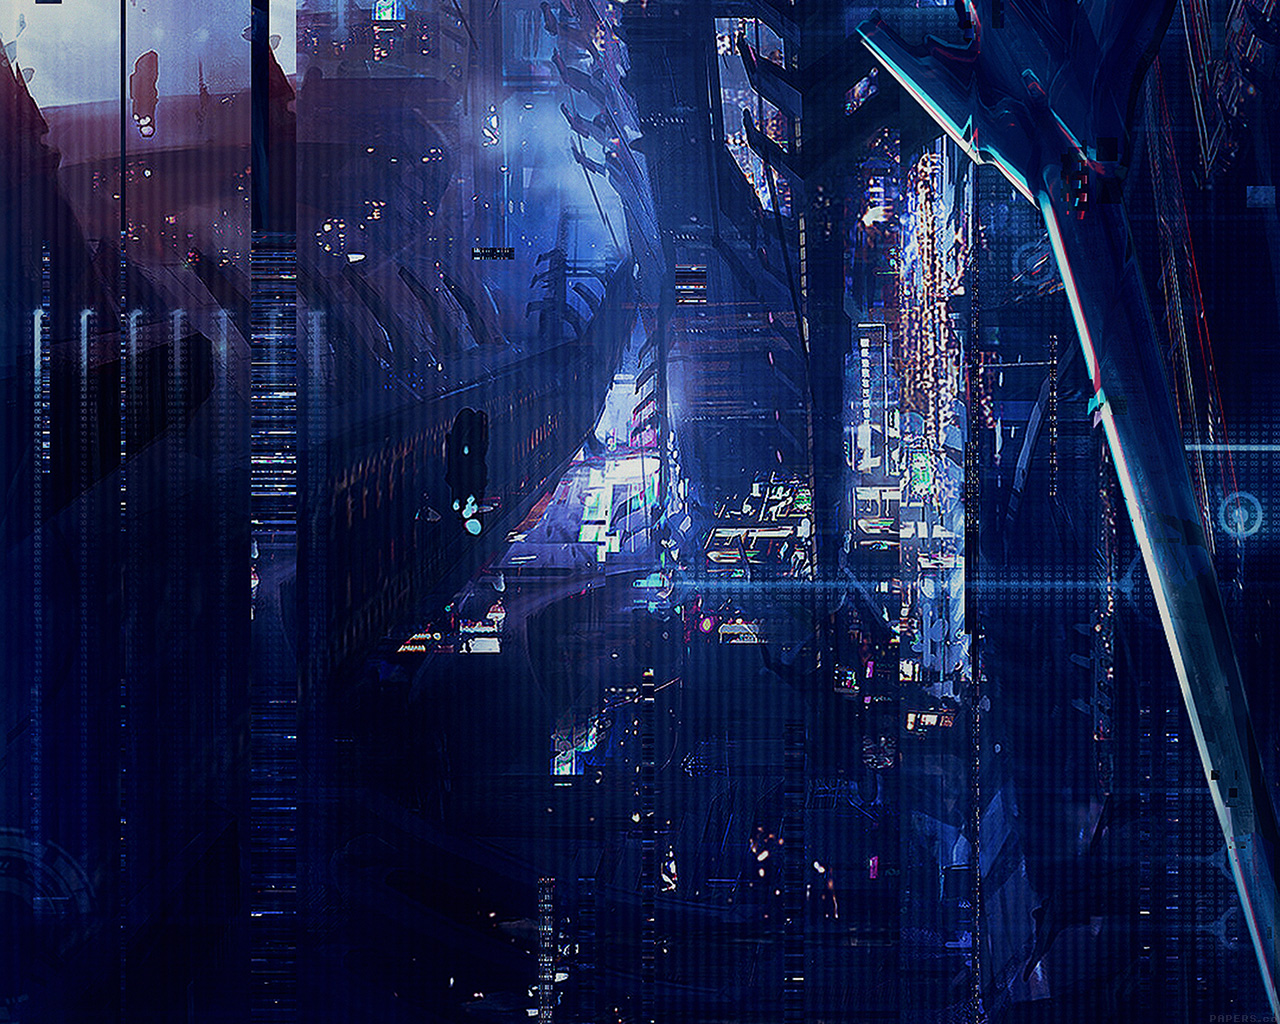 Fall Wallpaper Ipad Pro Af77 Digital World Anime Art Illust Urban Papers Co